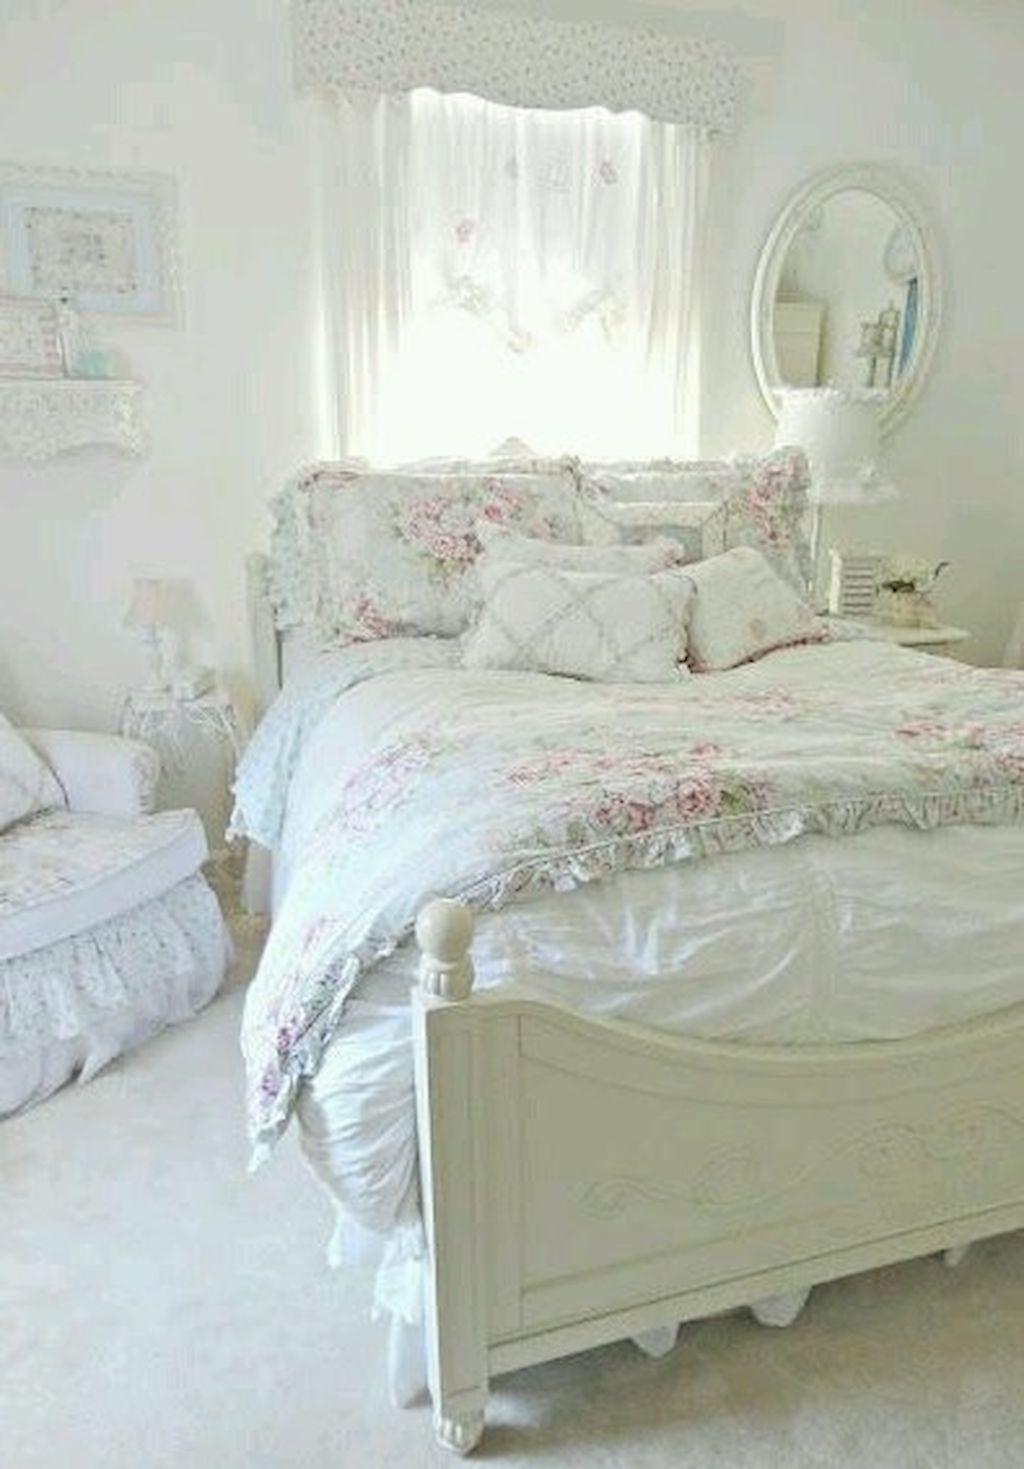 Cool 60 Romantic Shabby Chic Bedroom Decorating Ideas https ... Shabby Chic Romantic Bedroom Decorating Ideas on small cottage bedroom decorating ideas, vintage cottage bedroom decorating ideas, shabby vintage cottage bedroom,